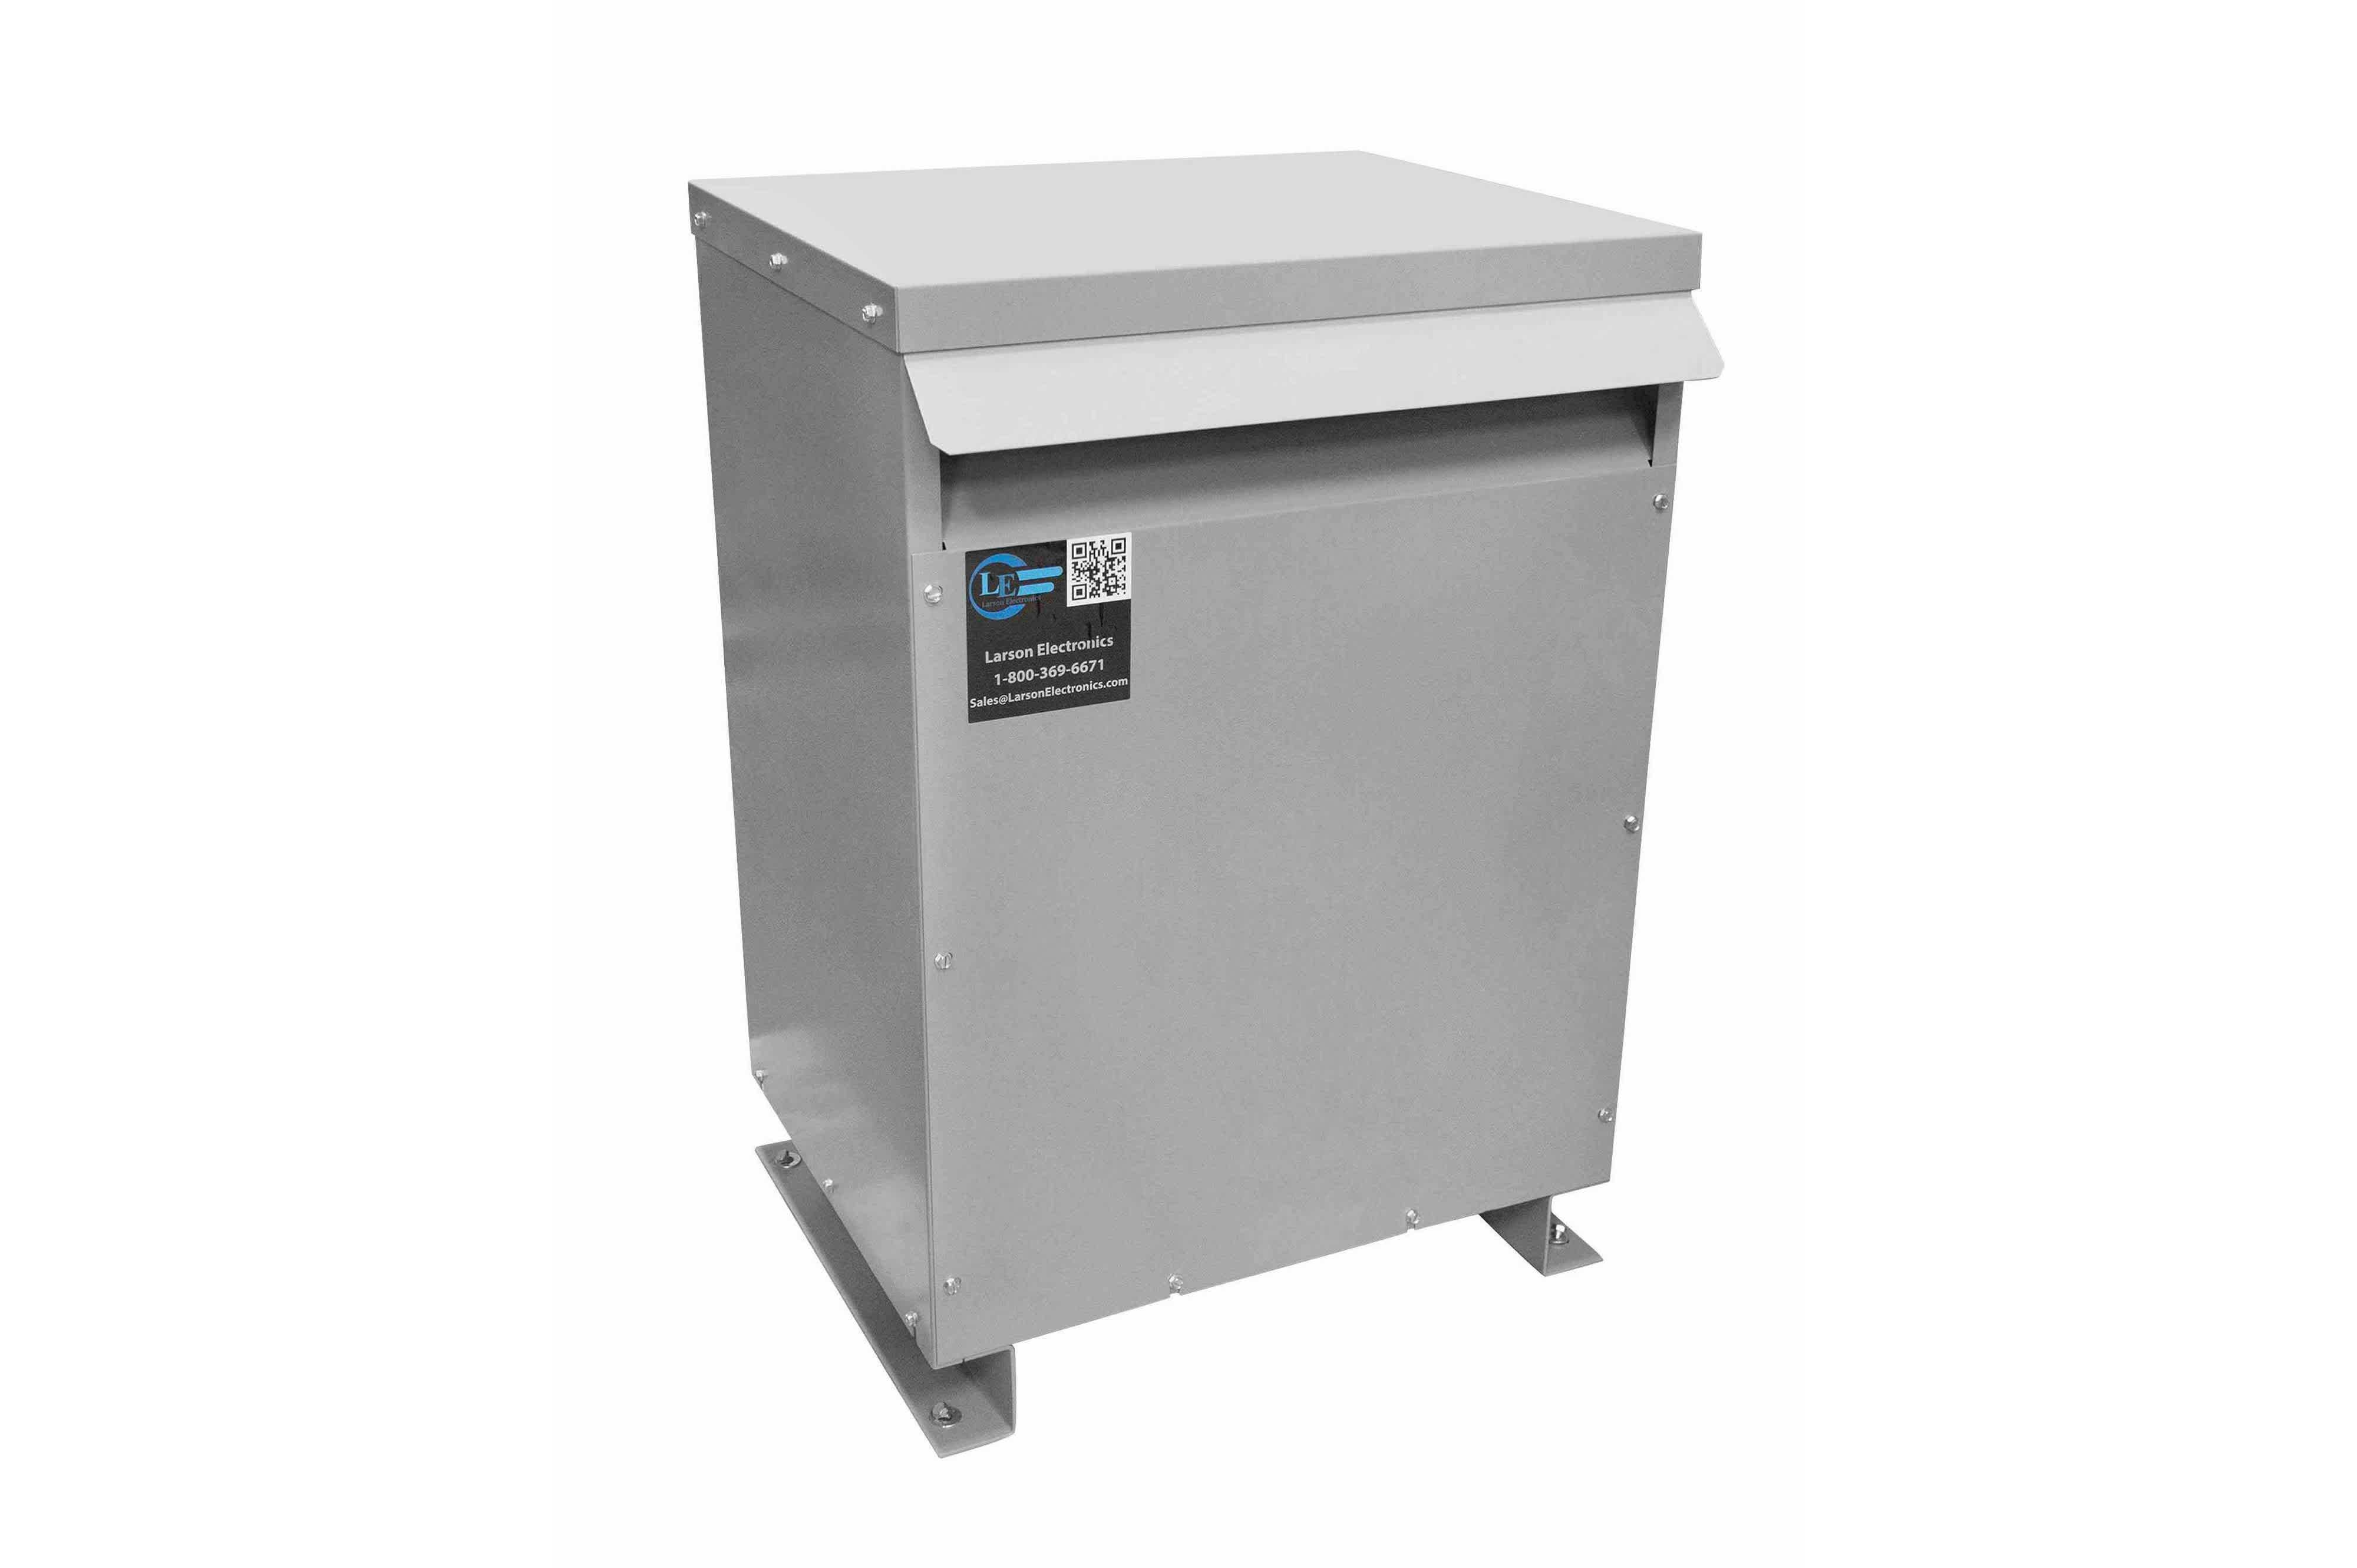 167 kVA 3PH DOE Transformer, 480V Delta Primary, 380Y/220 Wye-N Secondary, N3R, Ventilated, 60 Hz